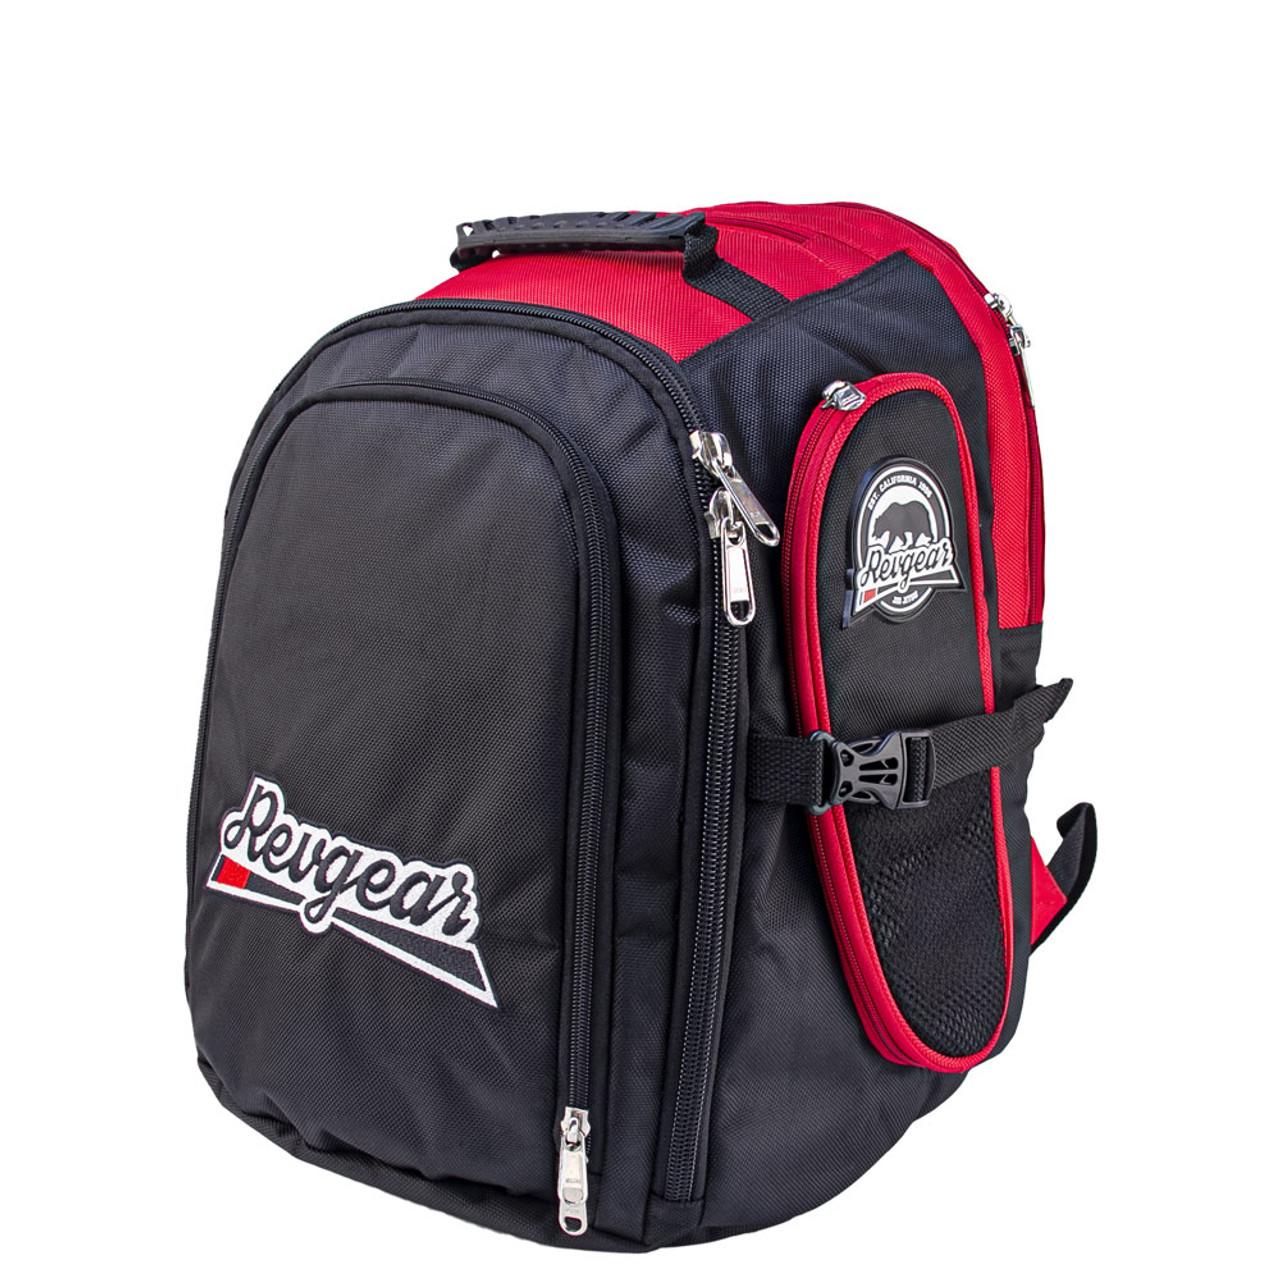 Travel Locker Urban - The Ultimate Martial Arts Backpack